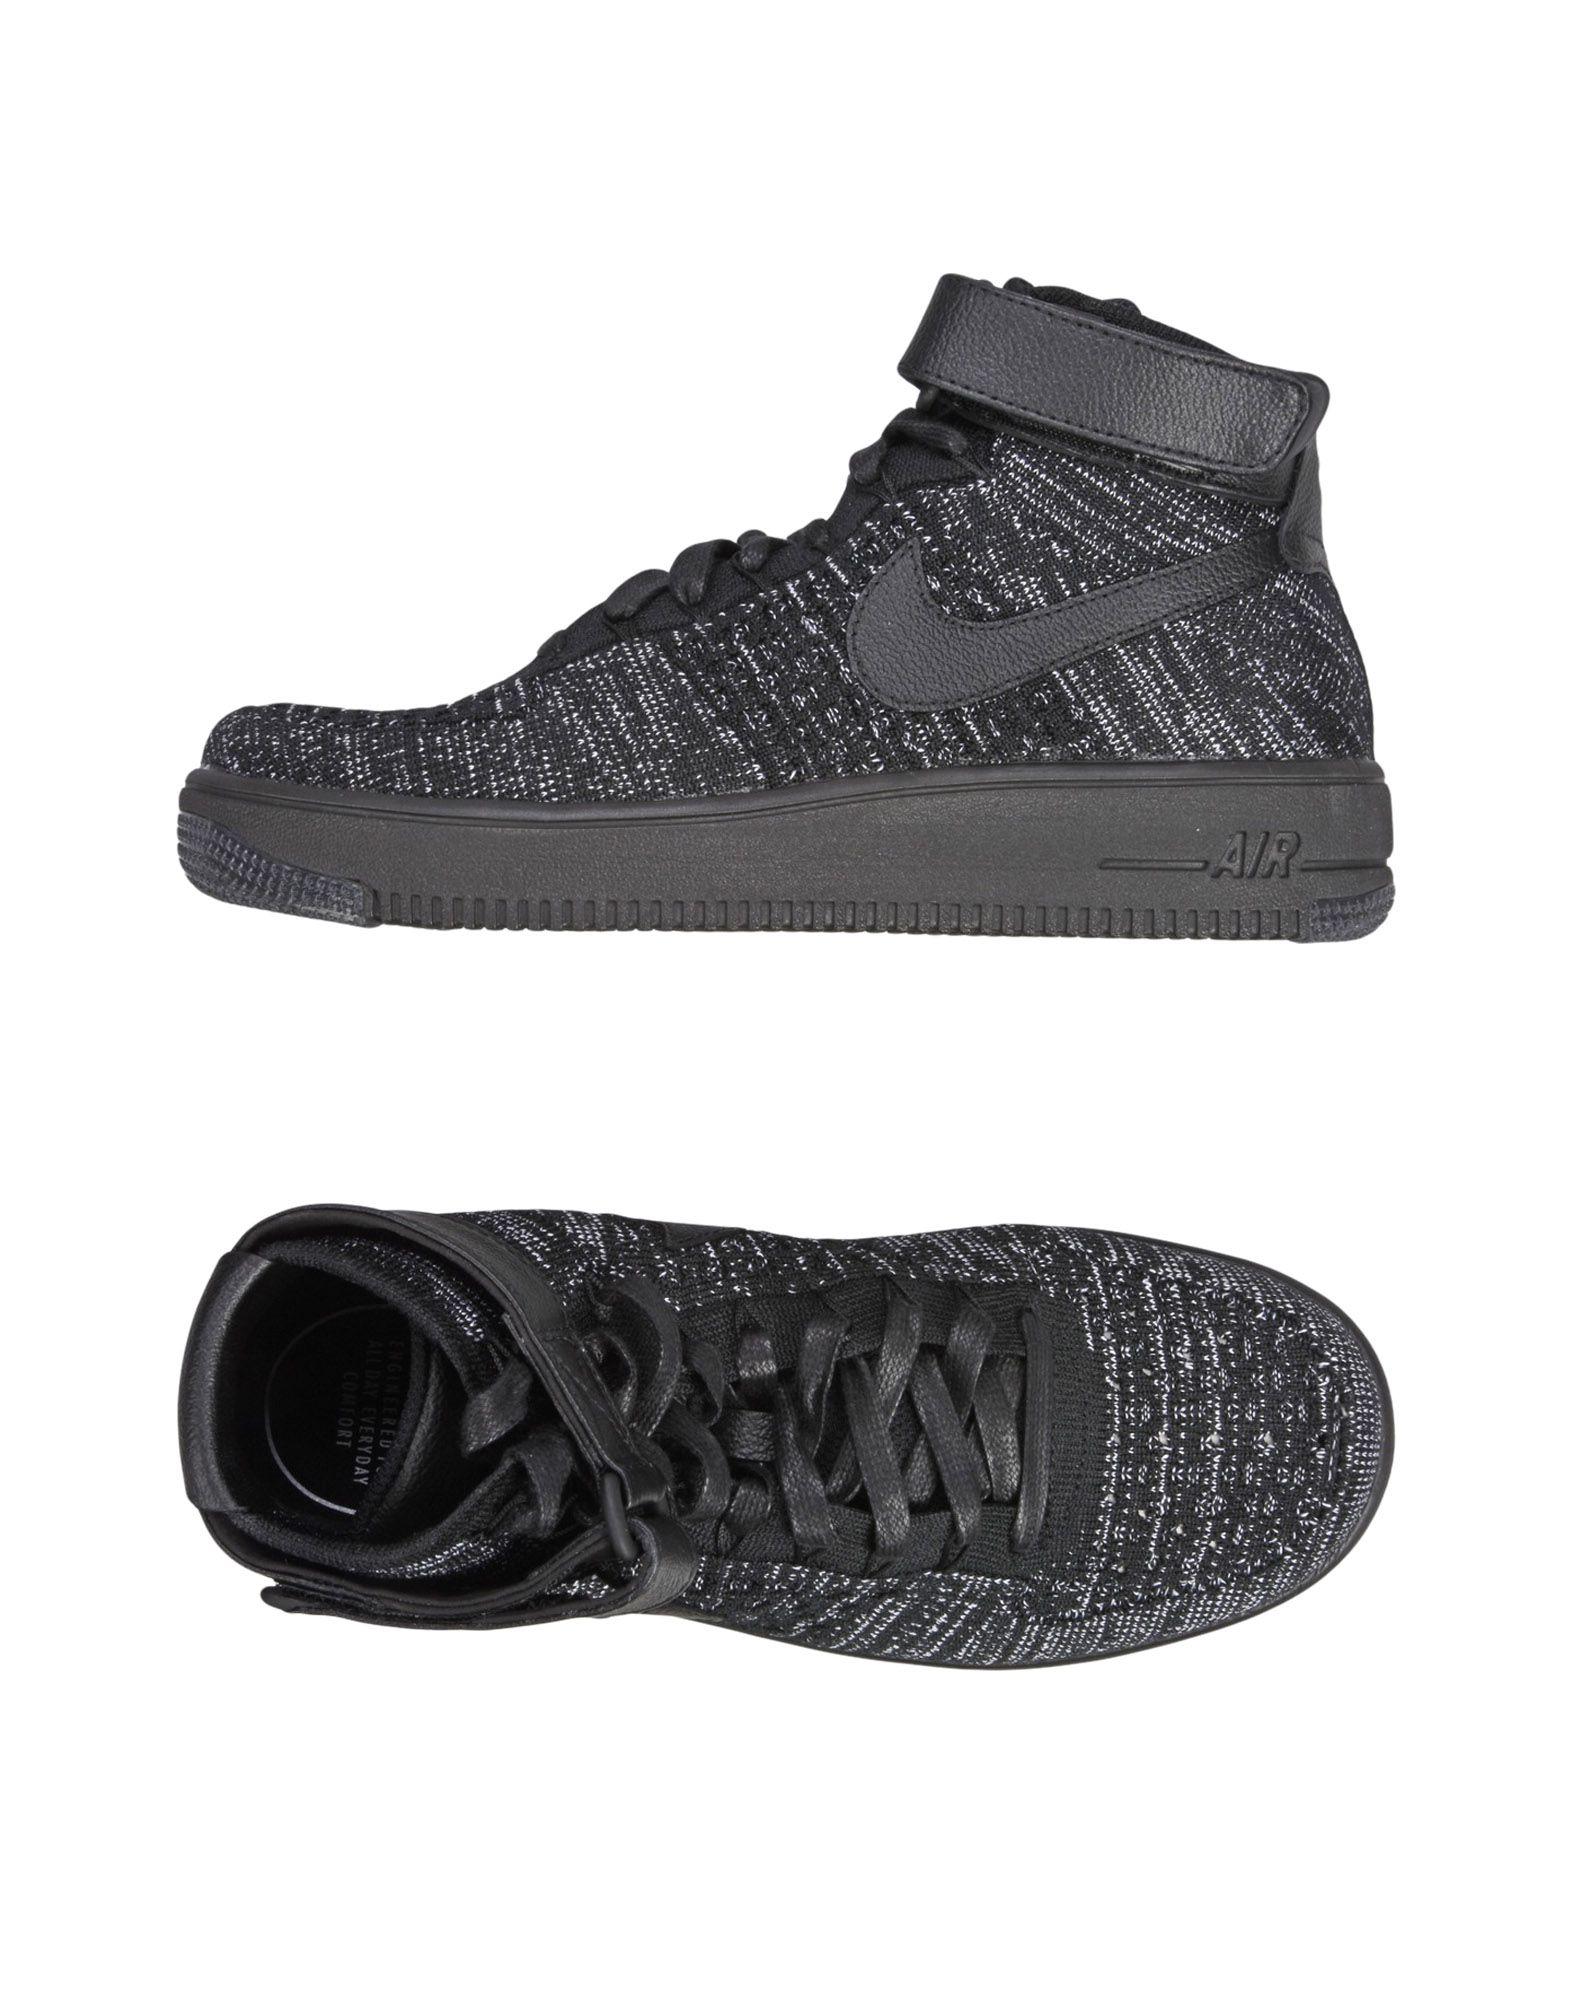 Nike   Nike  Af1 Flyknit Gutes Preis-Leistungs-Verhältnis, es lohnt sich 664480